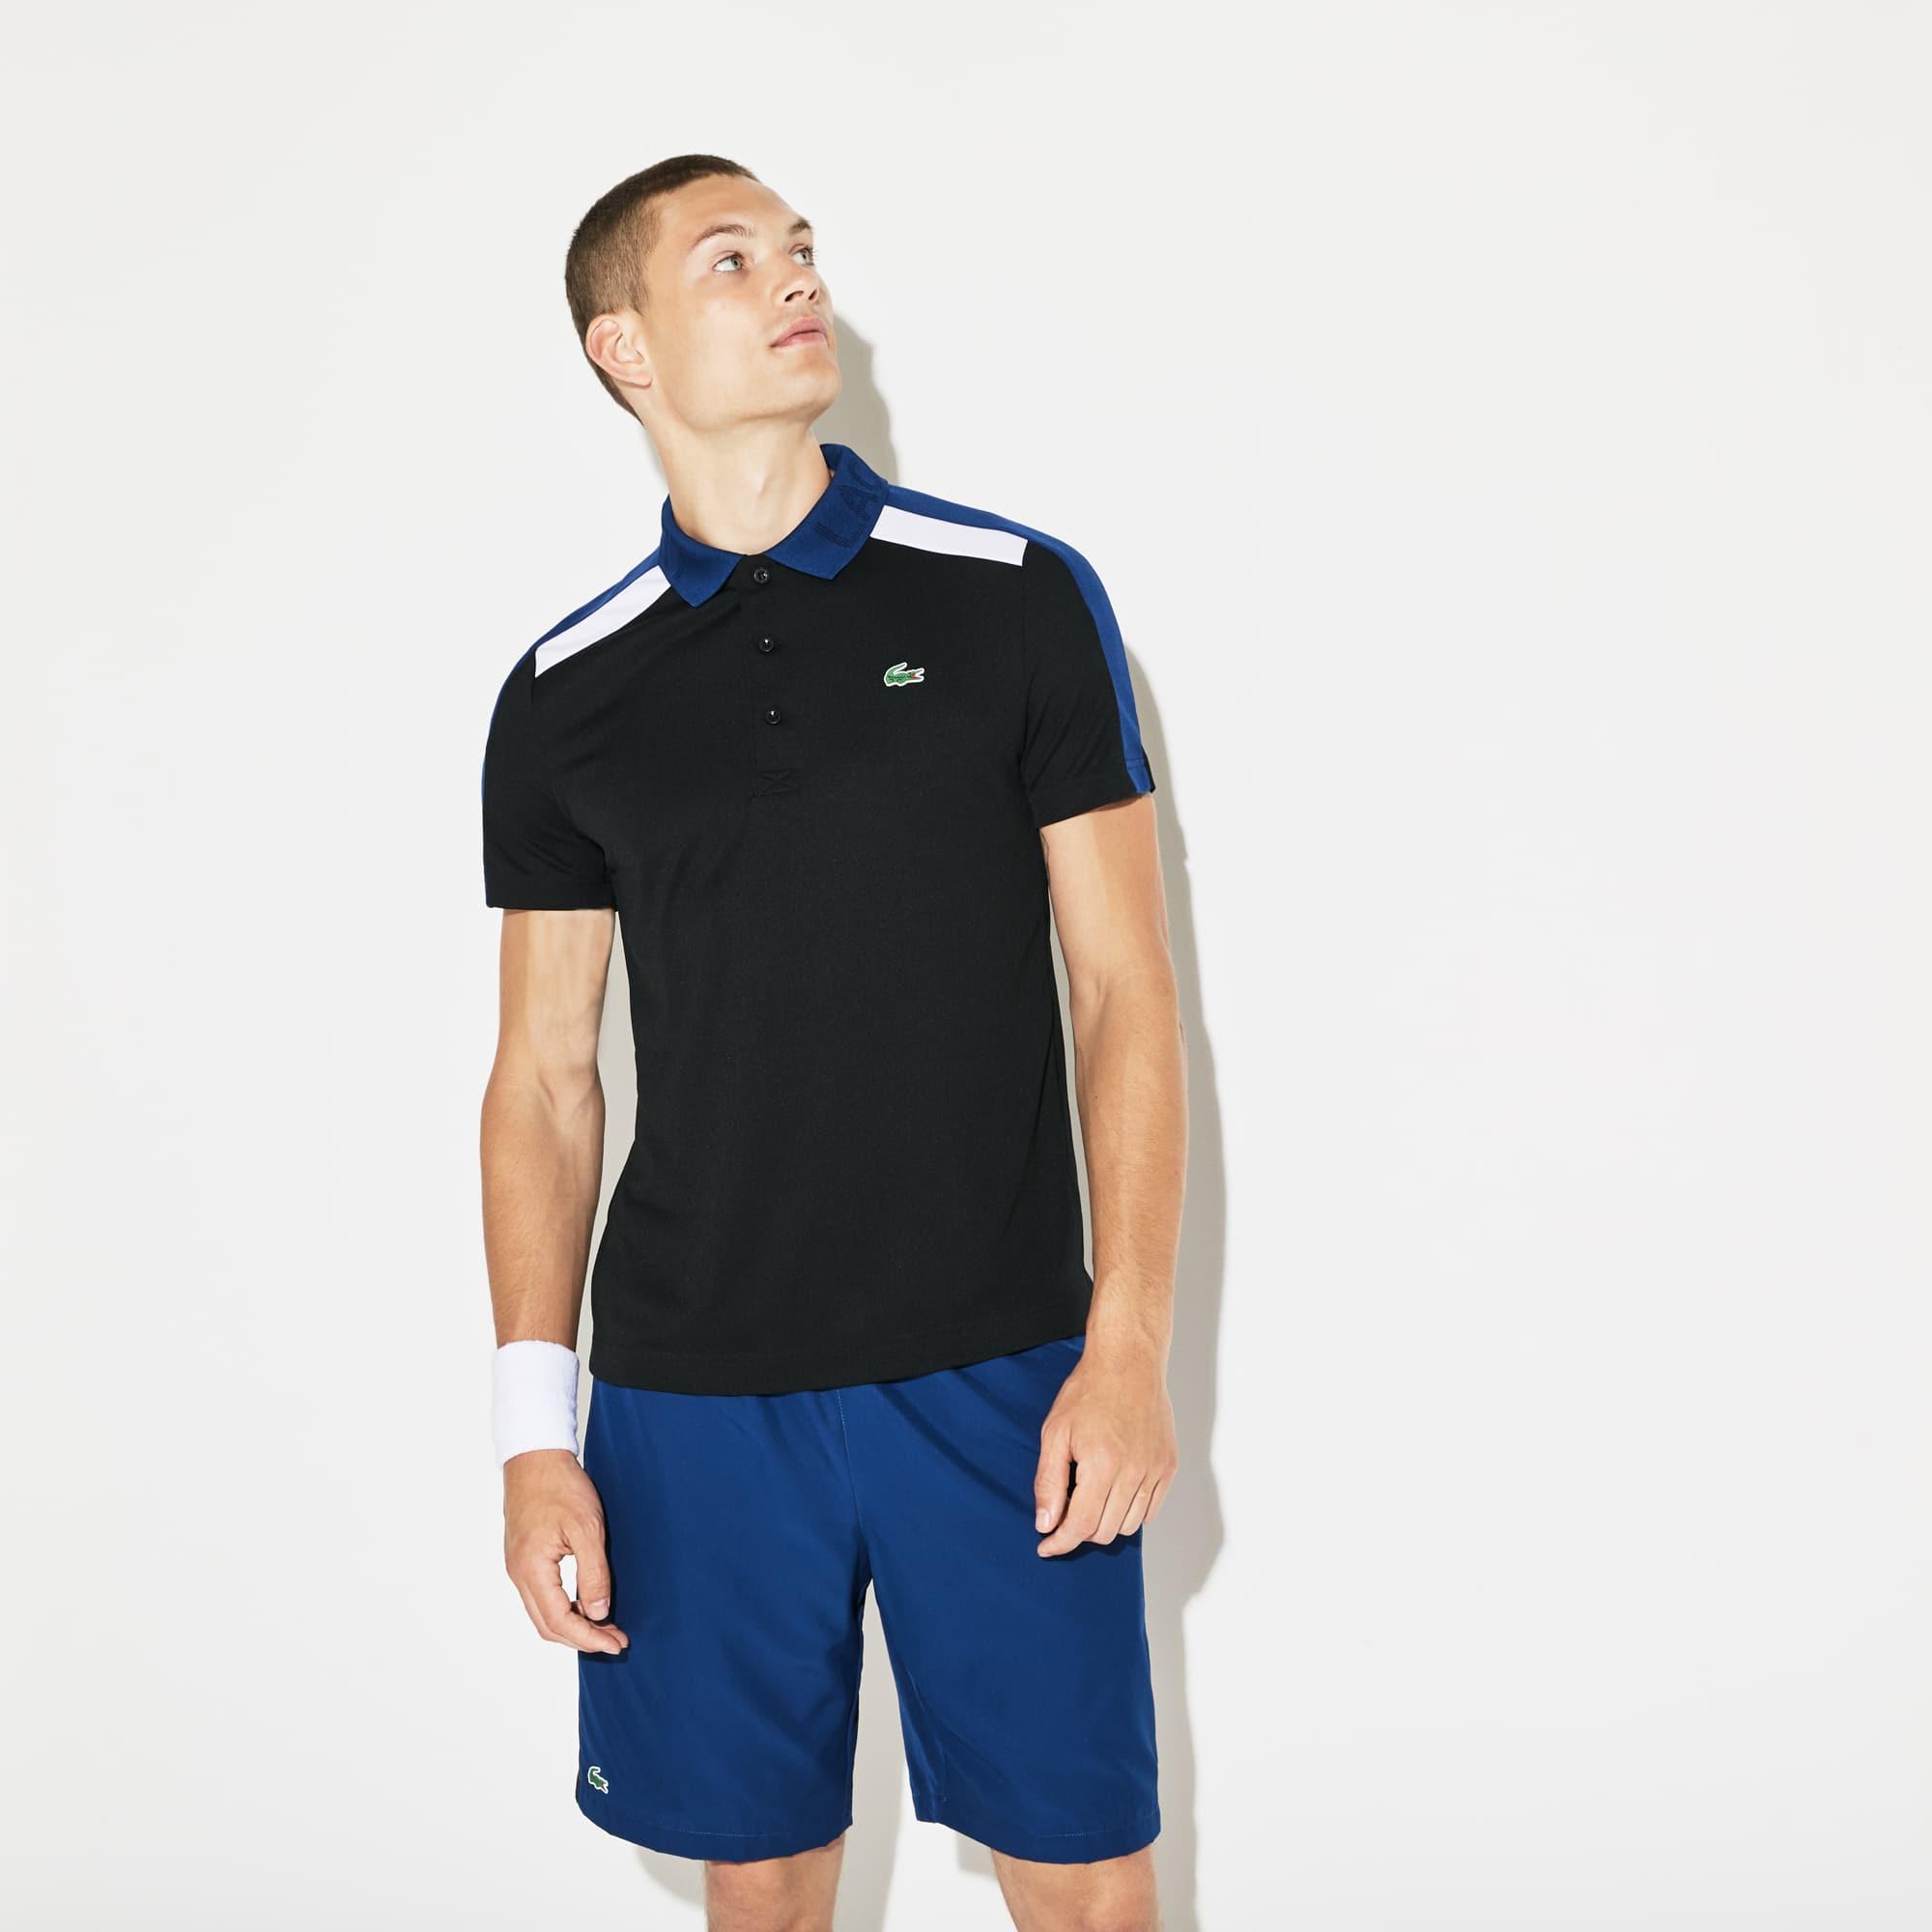 Lacoste - Herren LACOSTE SPORT Tennis-Poloshirt mit Kontraststreifen - 1